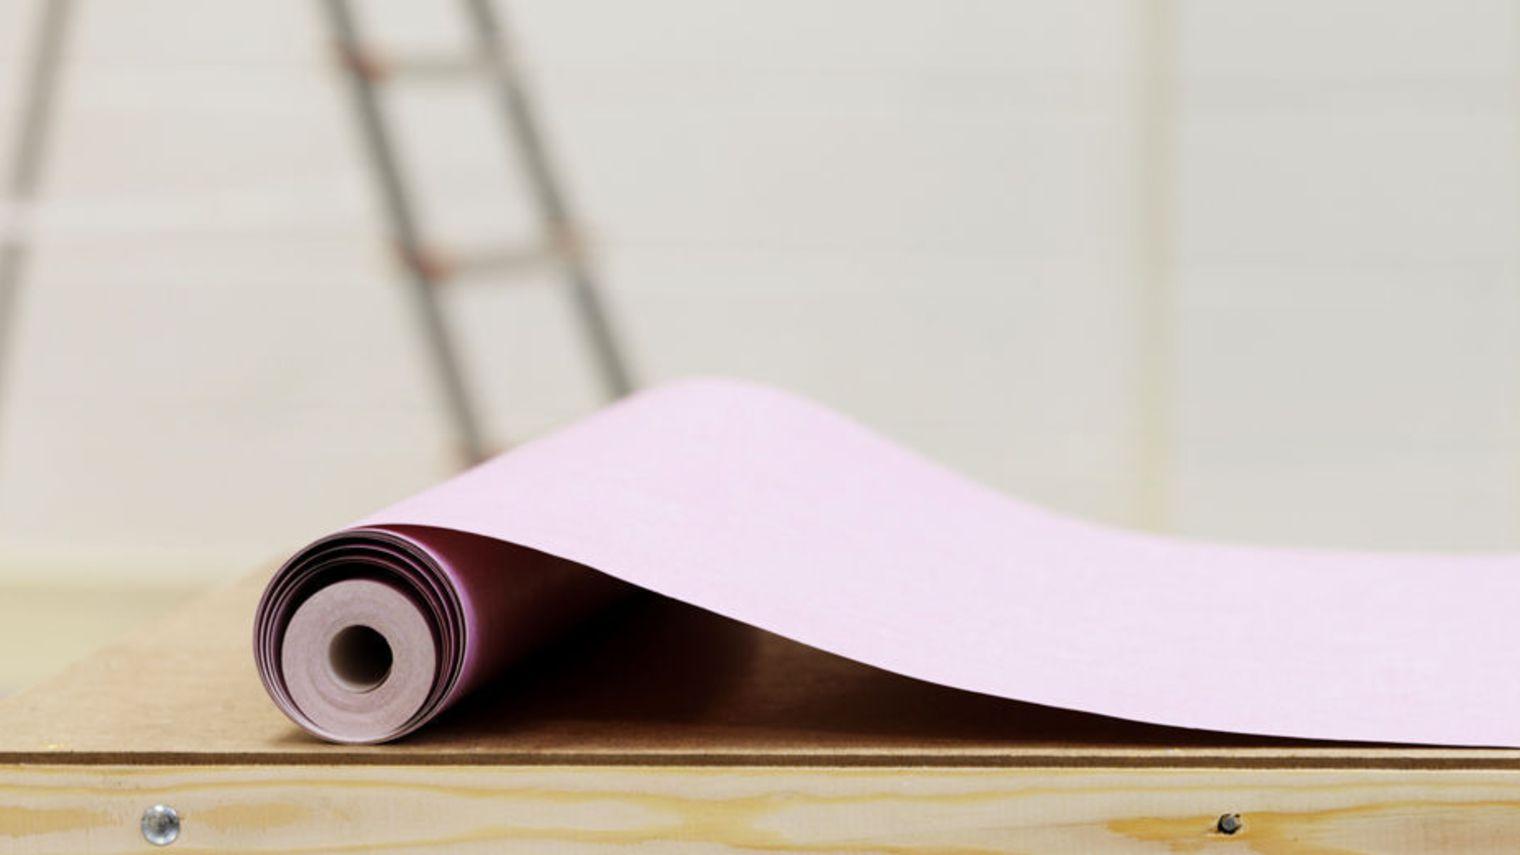 poser du papier peint intiss poser du papier peint intiss. Black Bedroom Furniture Sets. Home Design Ideas